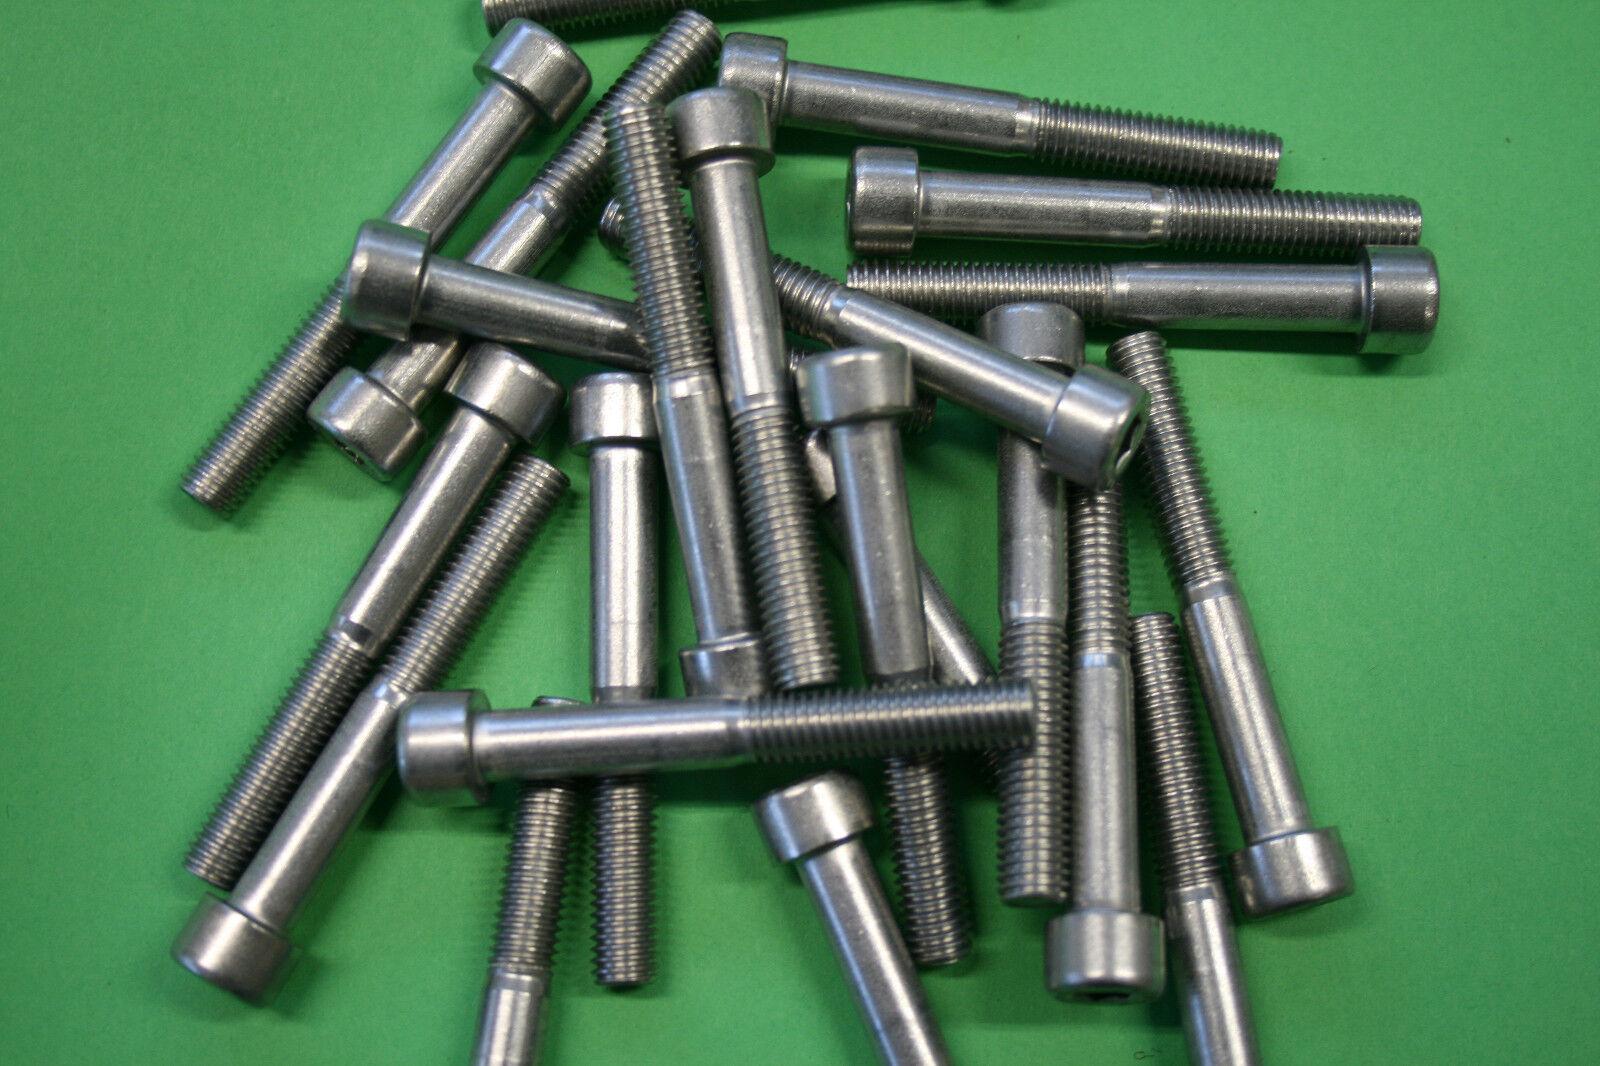 Gewindeschraube, Zylinderschrauben, M14 ,10-100mm, DIN 912 ,Edelstahl A2 V2A